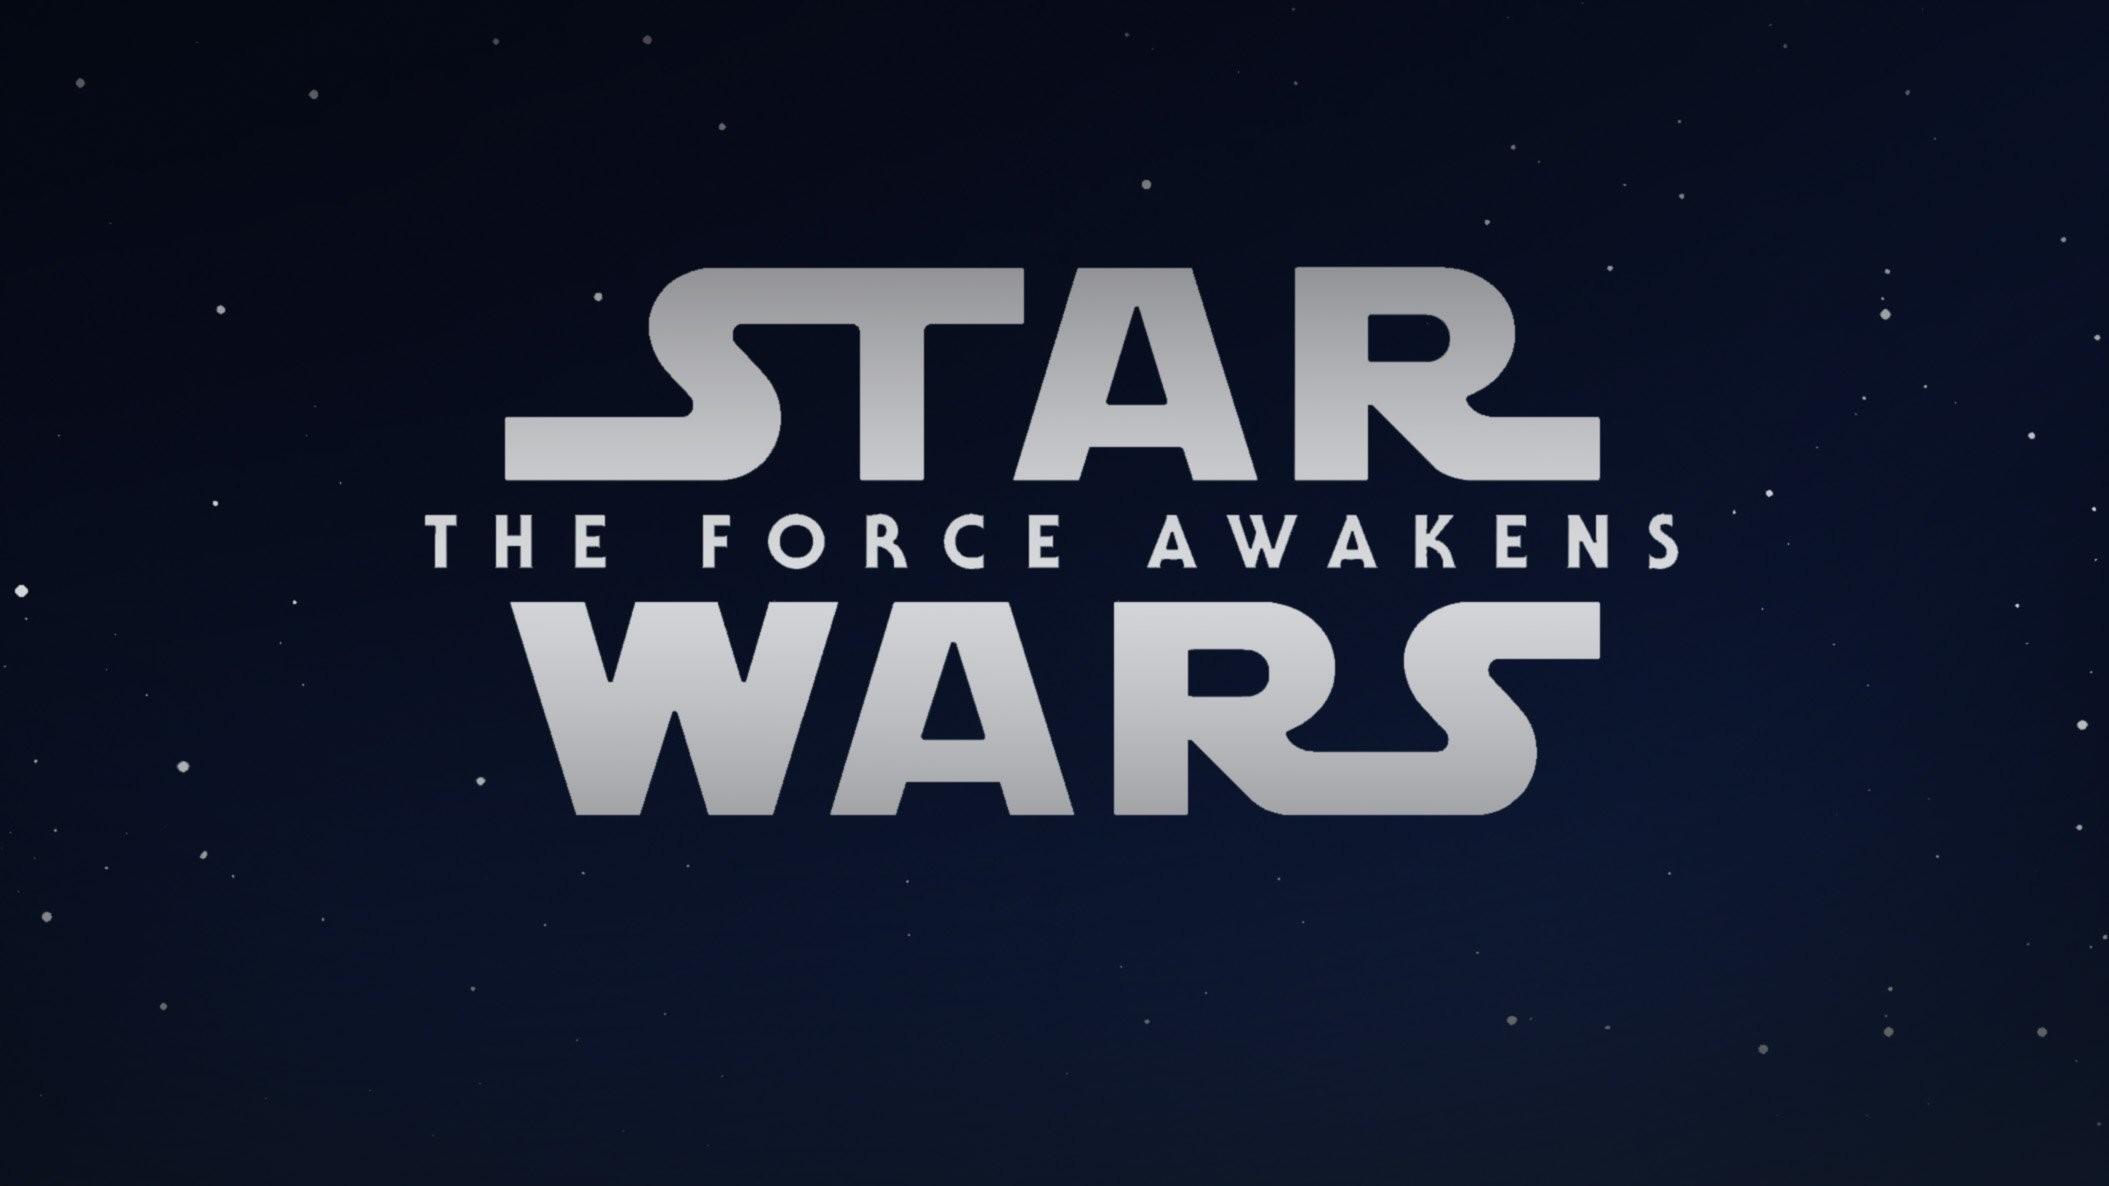 … Star Wars: The Force Awakens Wallpaper